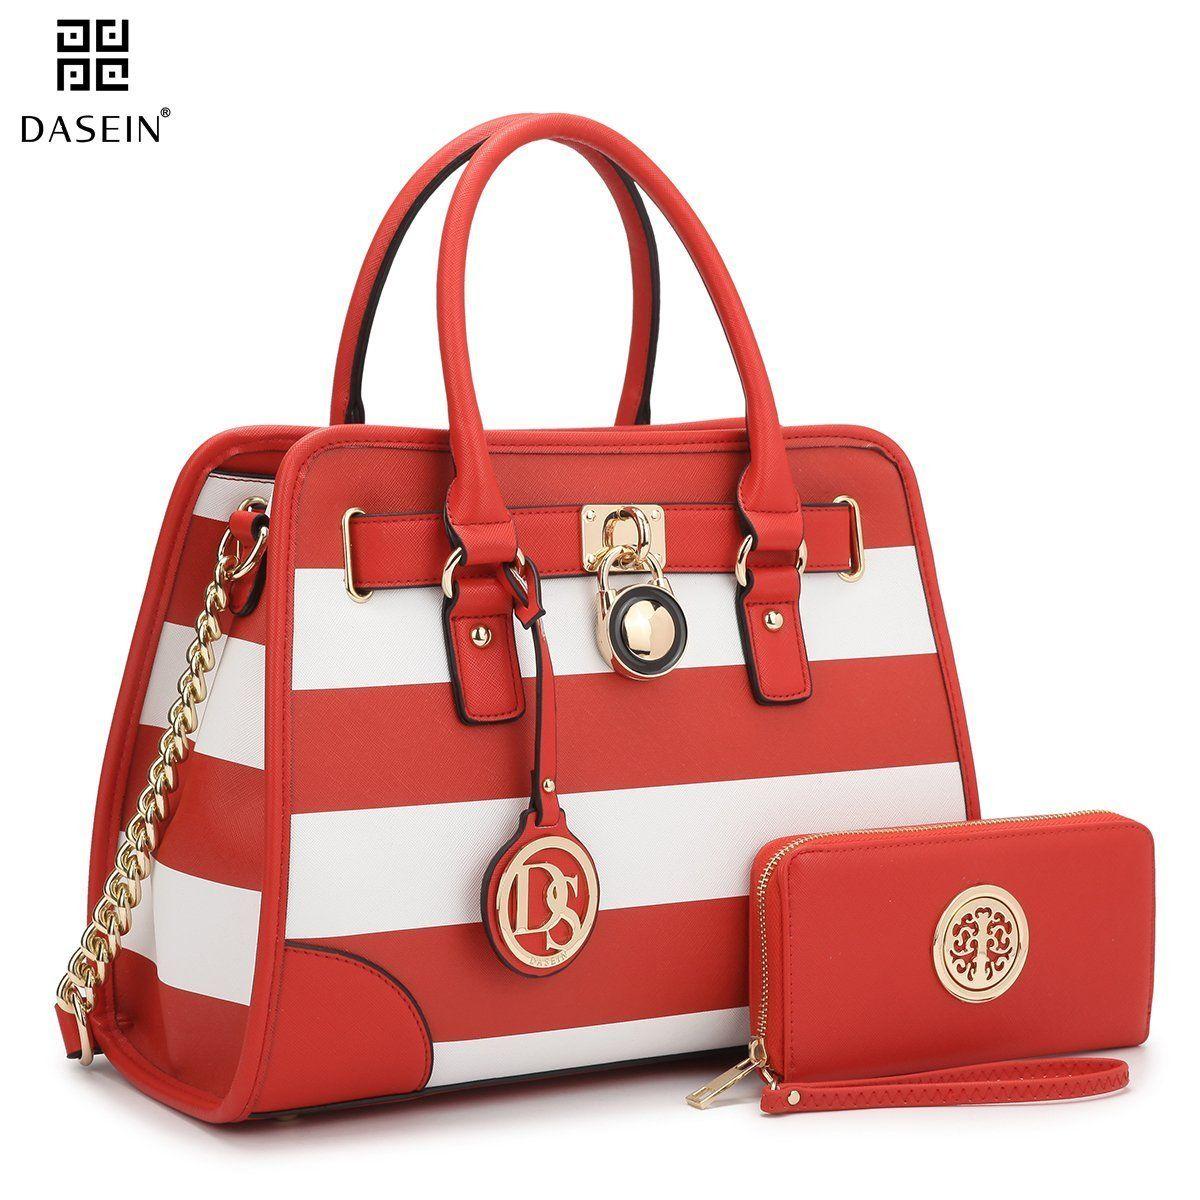 Image result for Dasein Women's Designer Handbags Padlock Belted Satchel Bags Top Handle Handbag Purse Shoulder Bag w/Matching Wallet